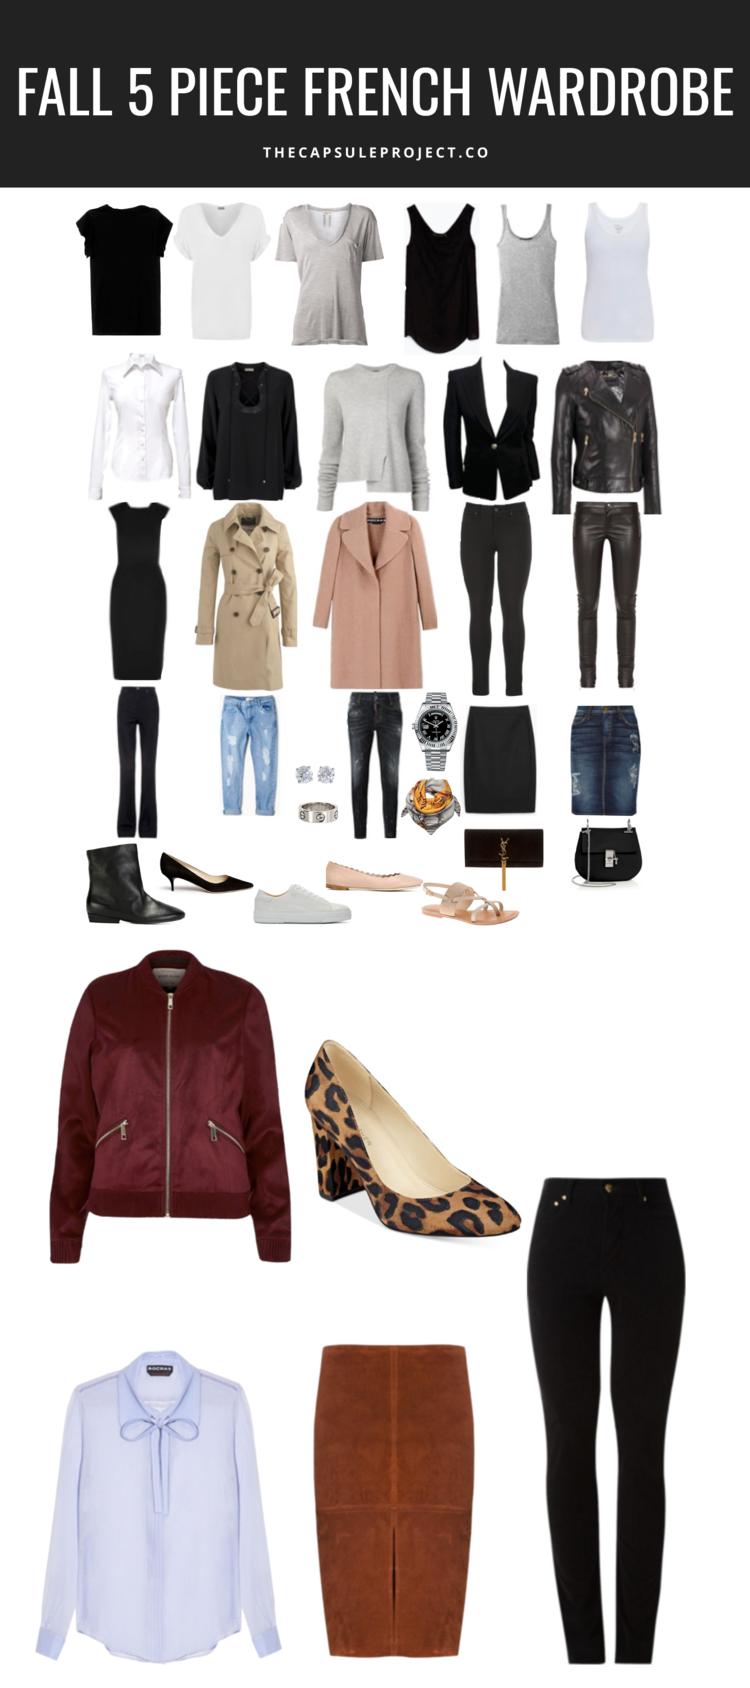 Fall 2016 Five Piece French Wardrobe